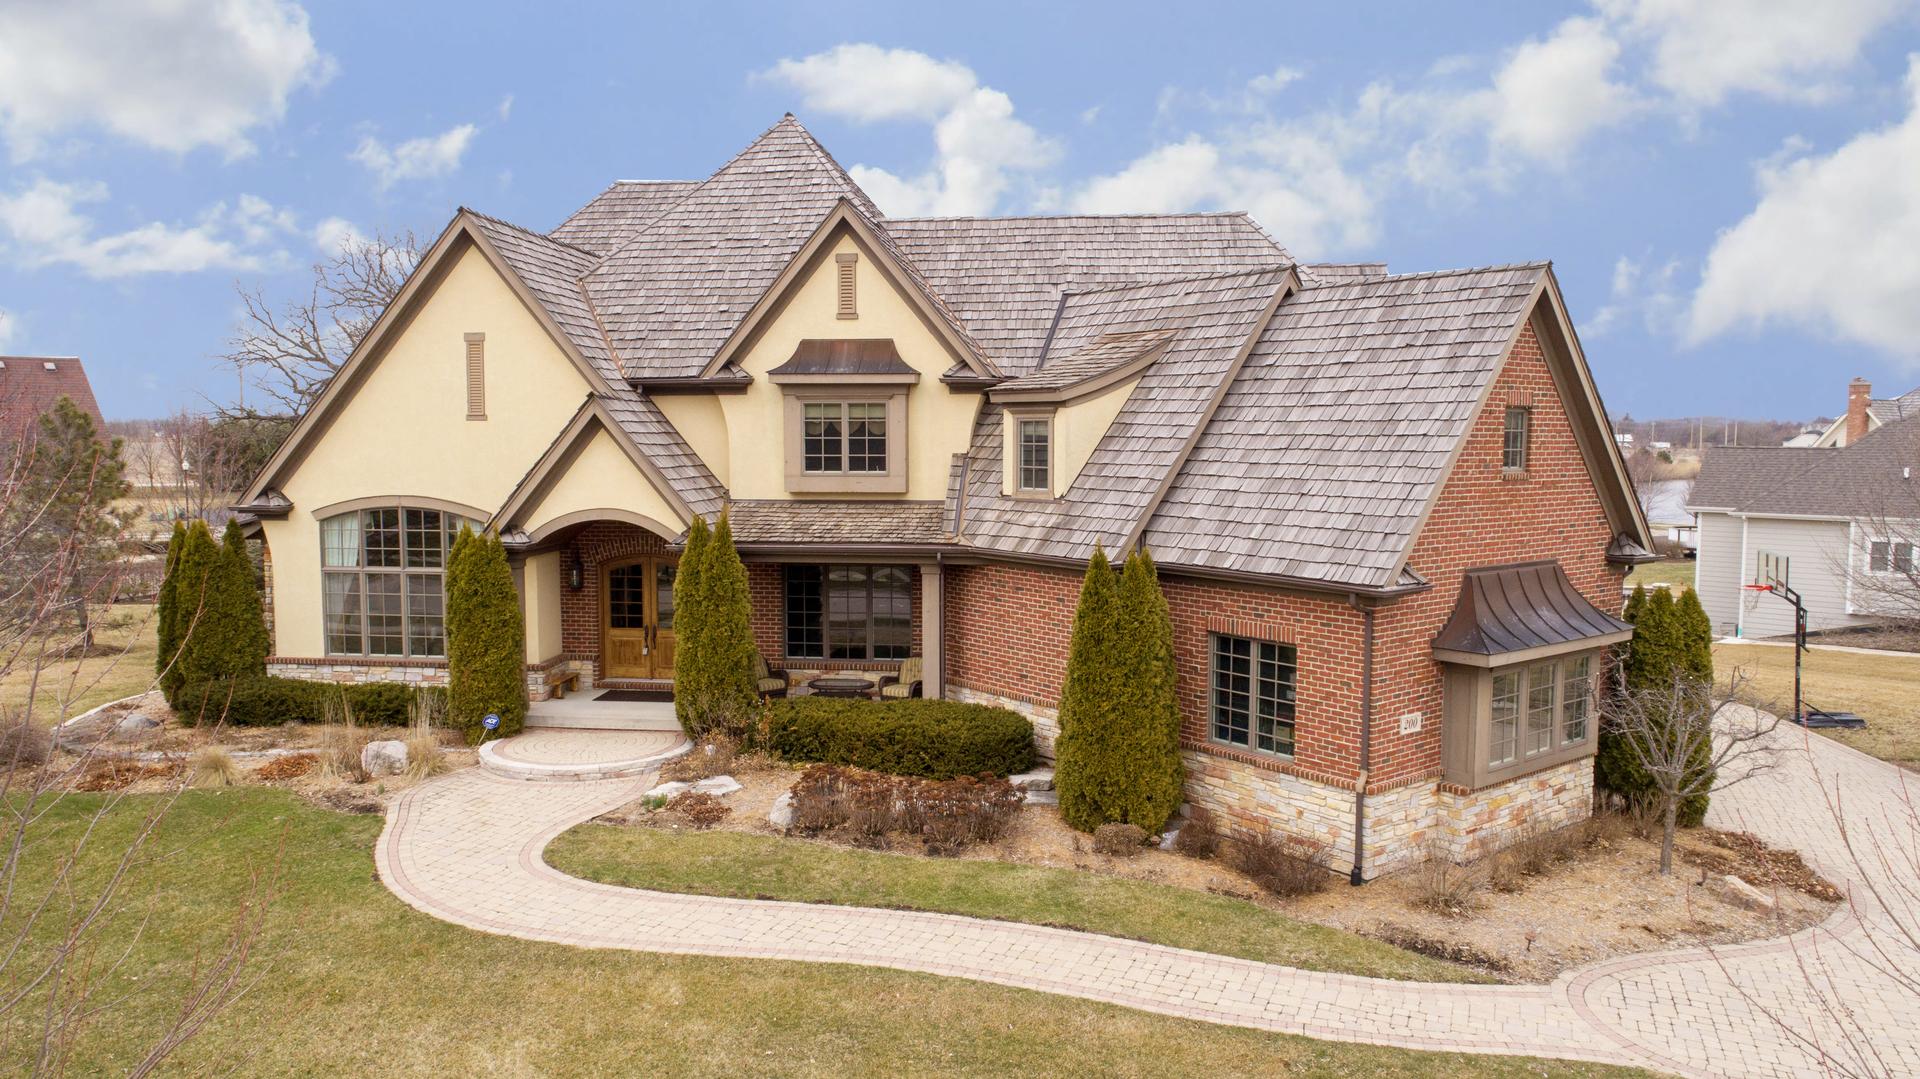 200 Wrenwood Circle, Elgin, IL 60124